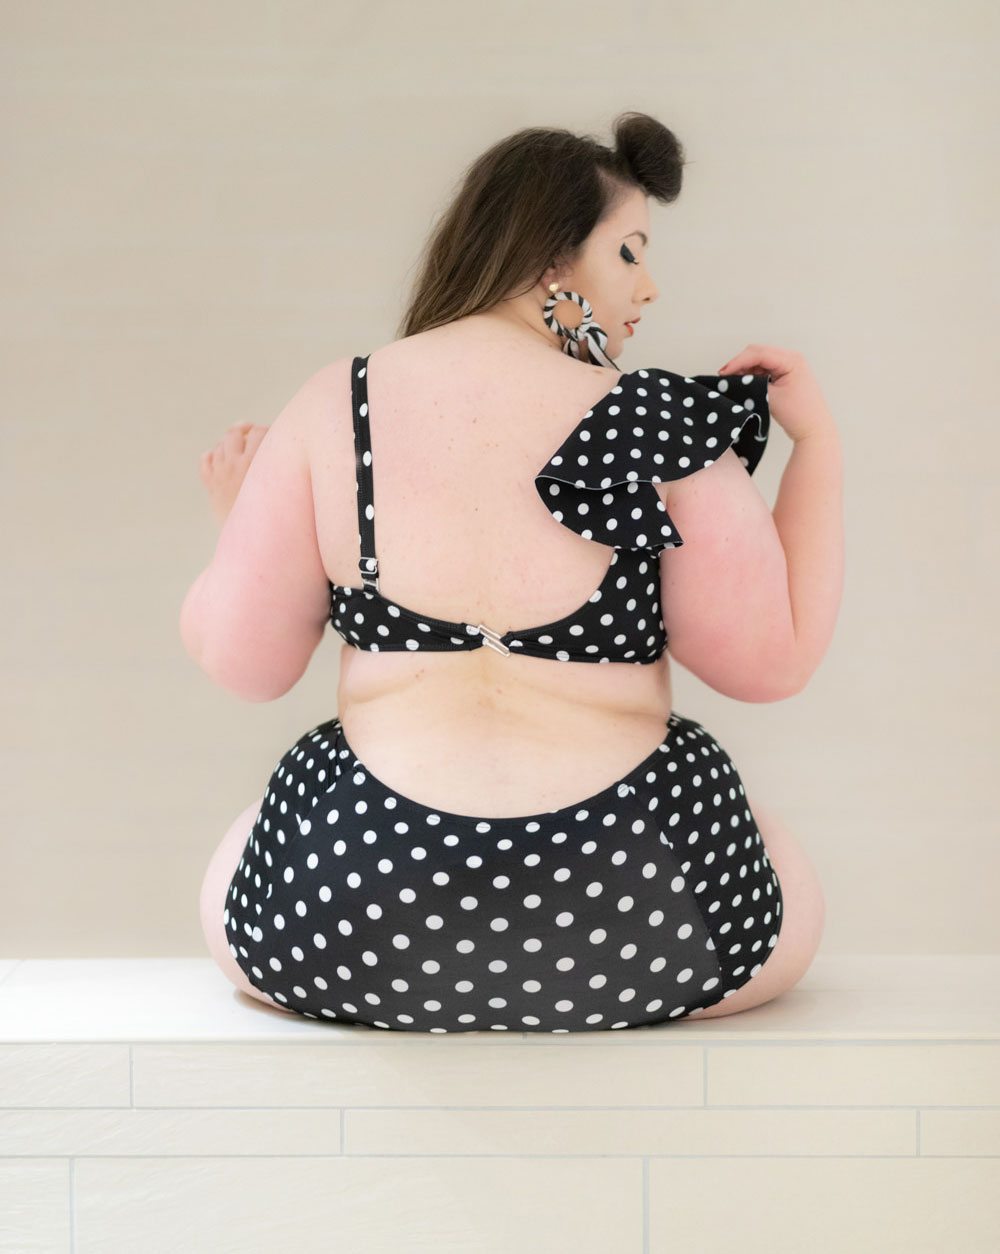 eloquii swimsuit swimwear maillot de bain grande taille bikini blog ronde bodypositive